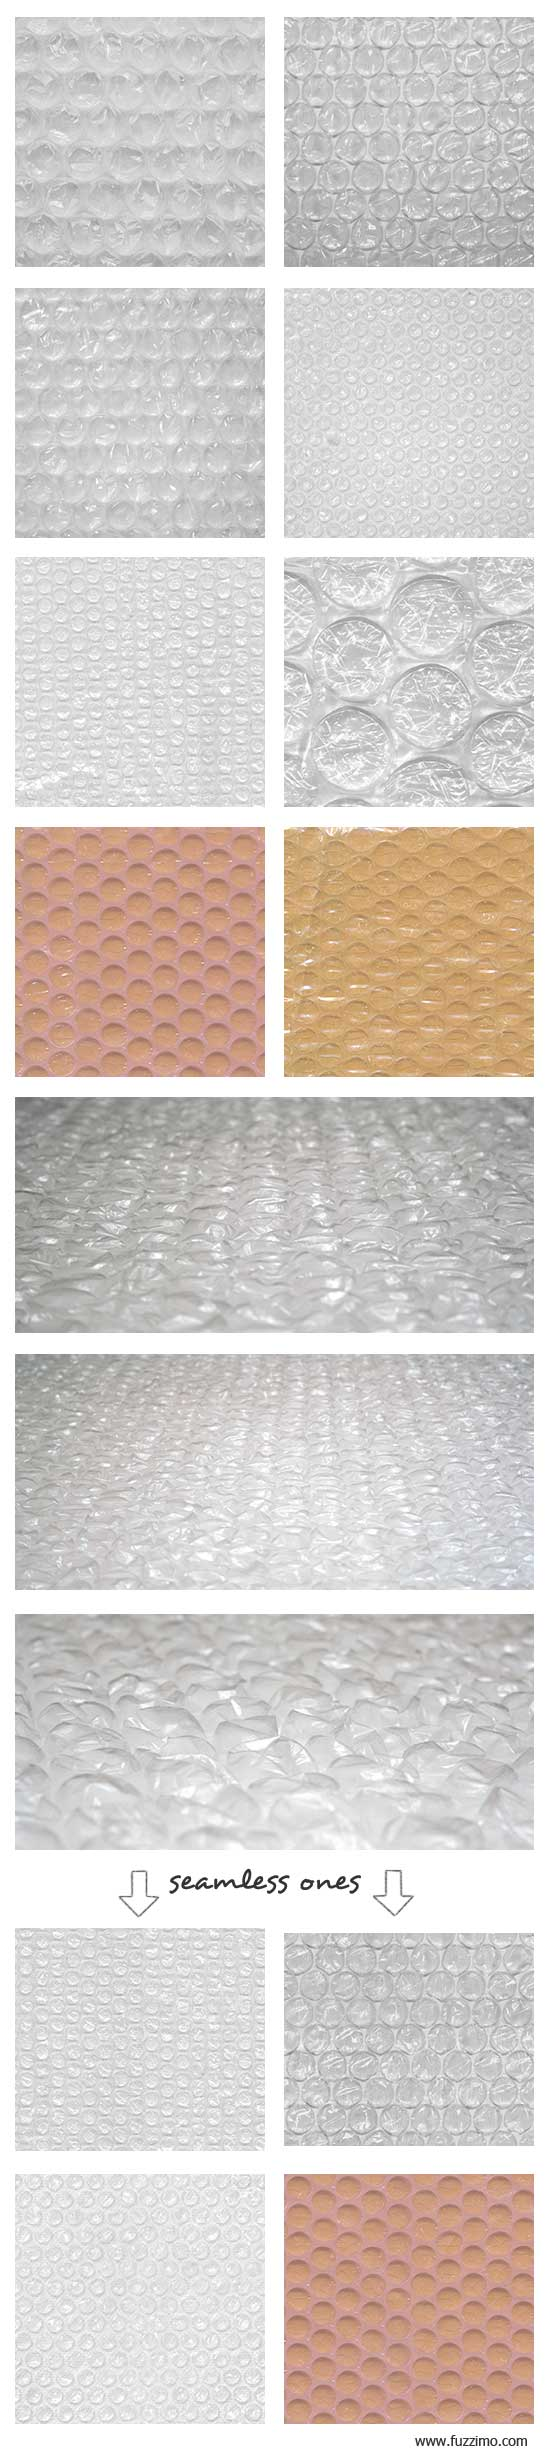 fzm-BubbleWrap.textures-02